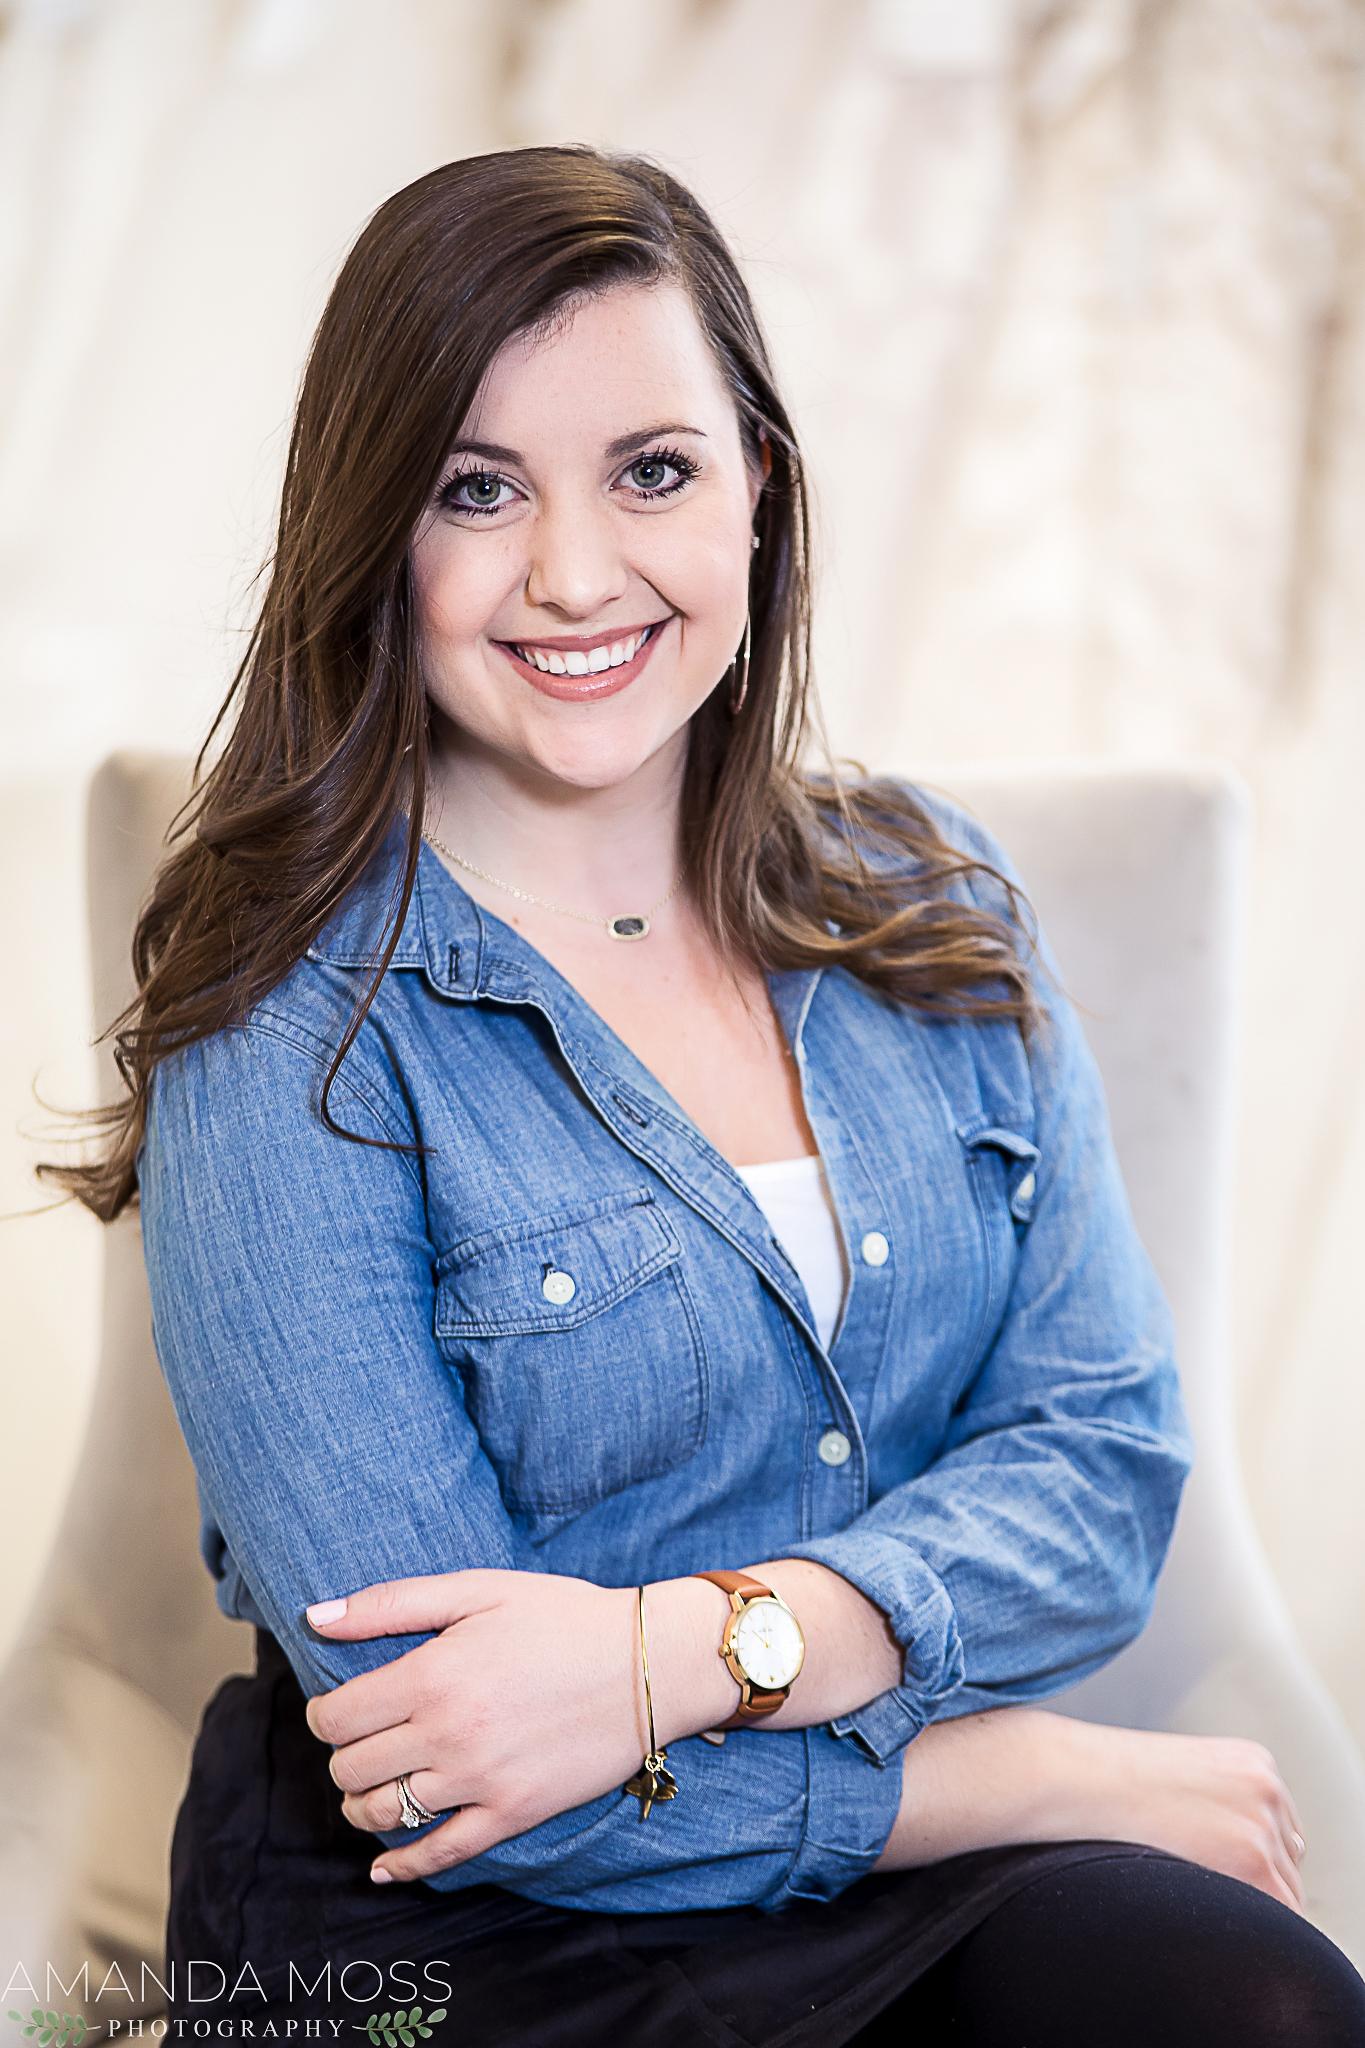 charlotte north carolina branding headshot photographer wedding lifestyle portraits